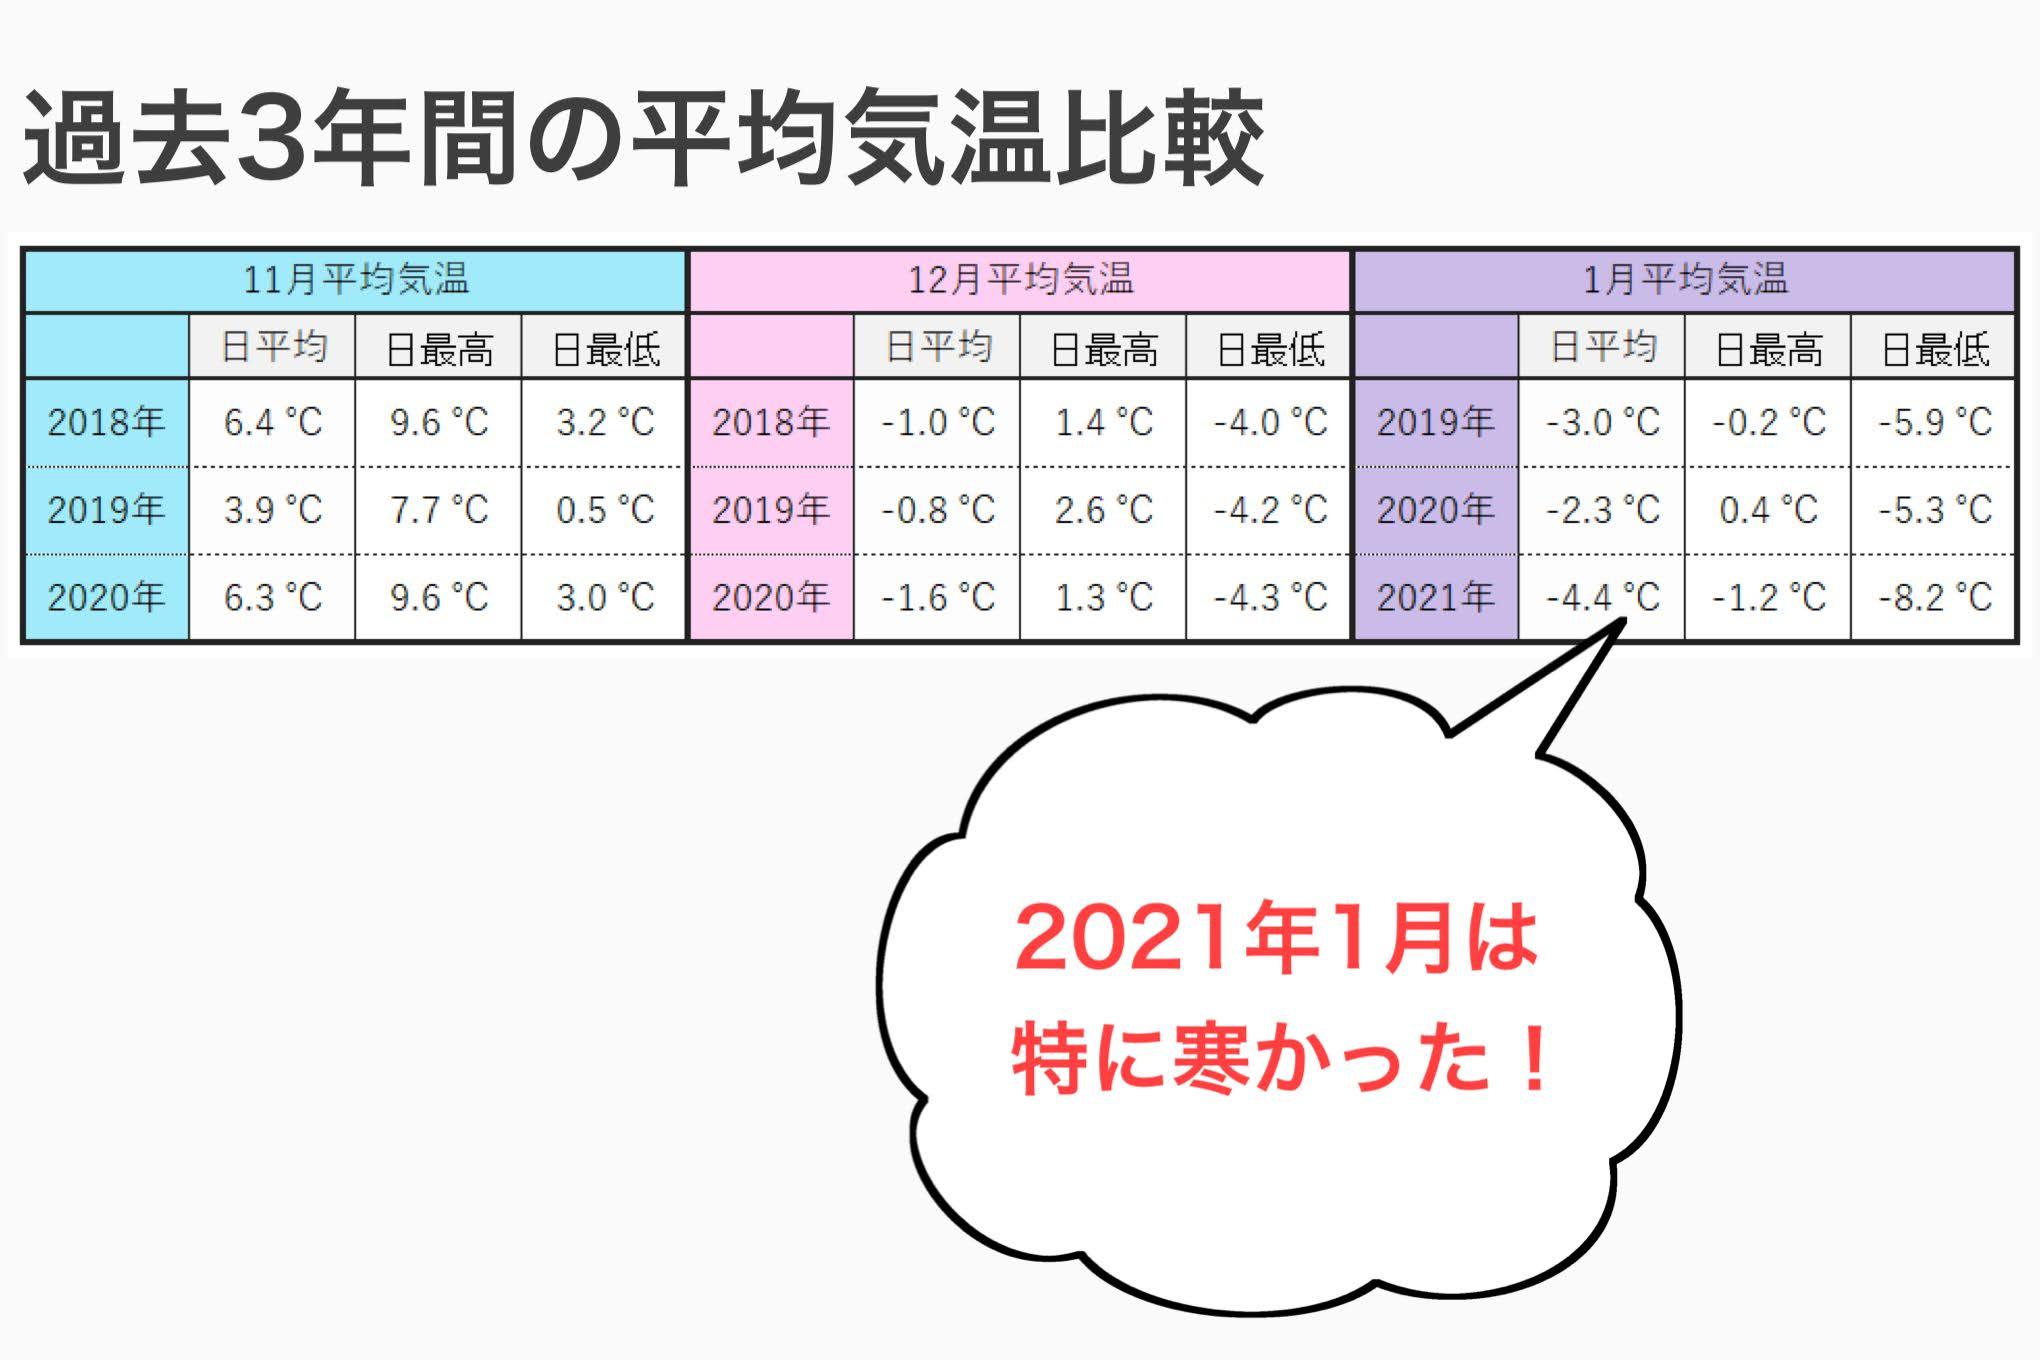 平均気温の比較